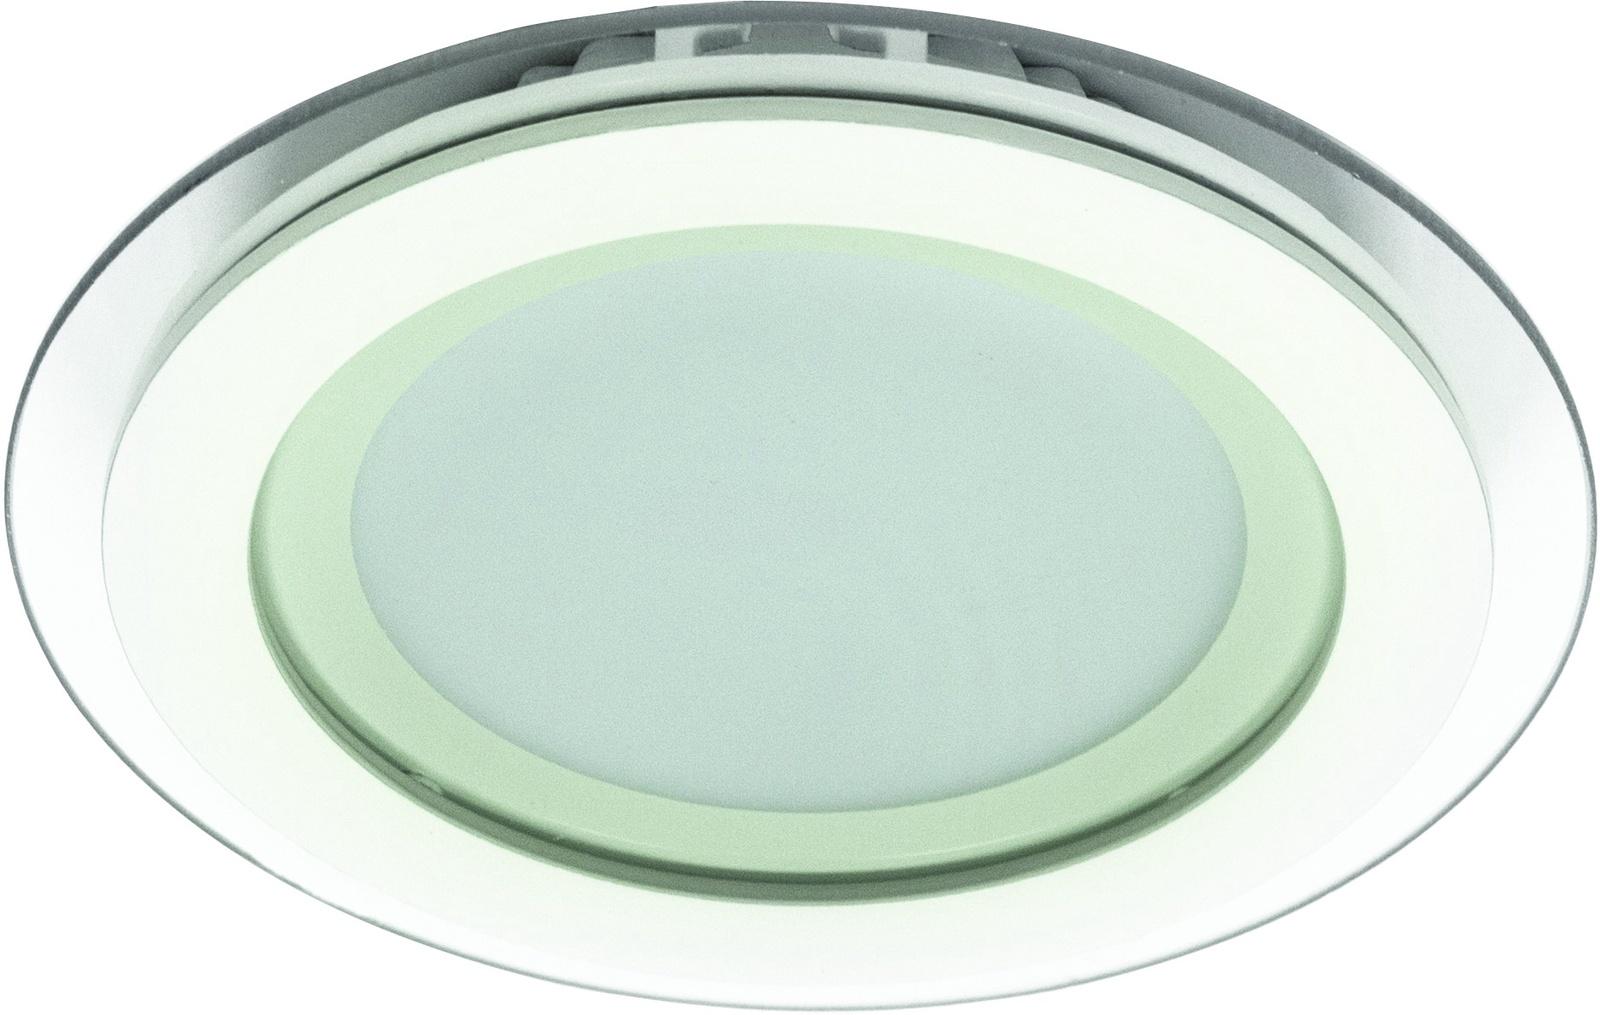 Встраиваемый светильник Arte Lamp A4106PL-1WH, LED, 6 Вт светильник встраиваемый arte lamp a4106pl 1wh